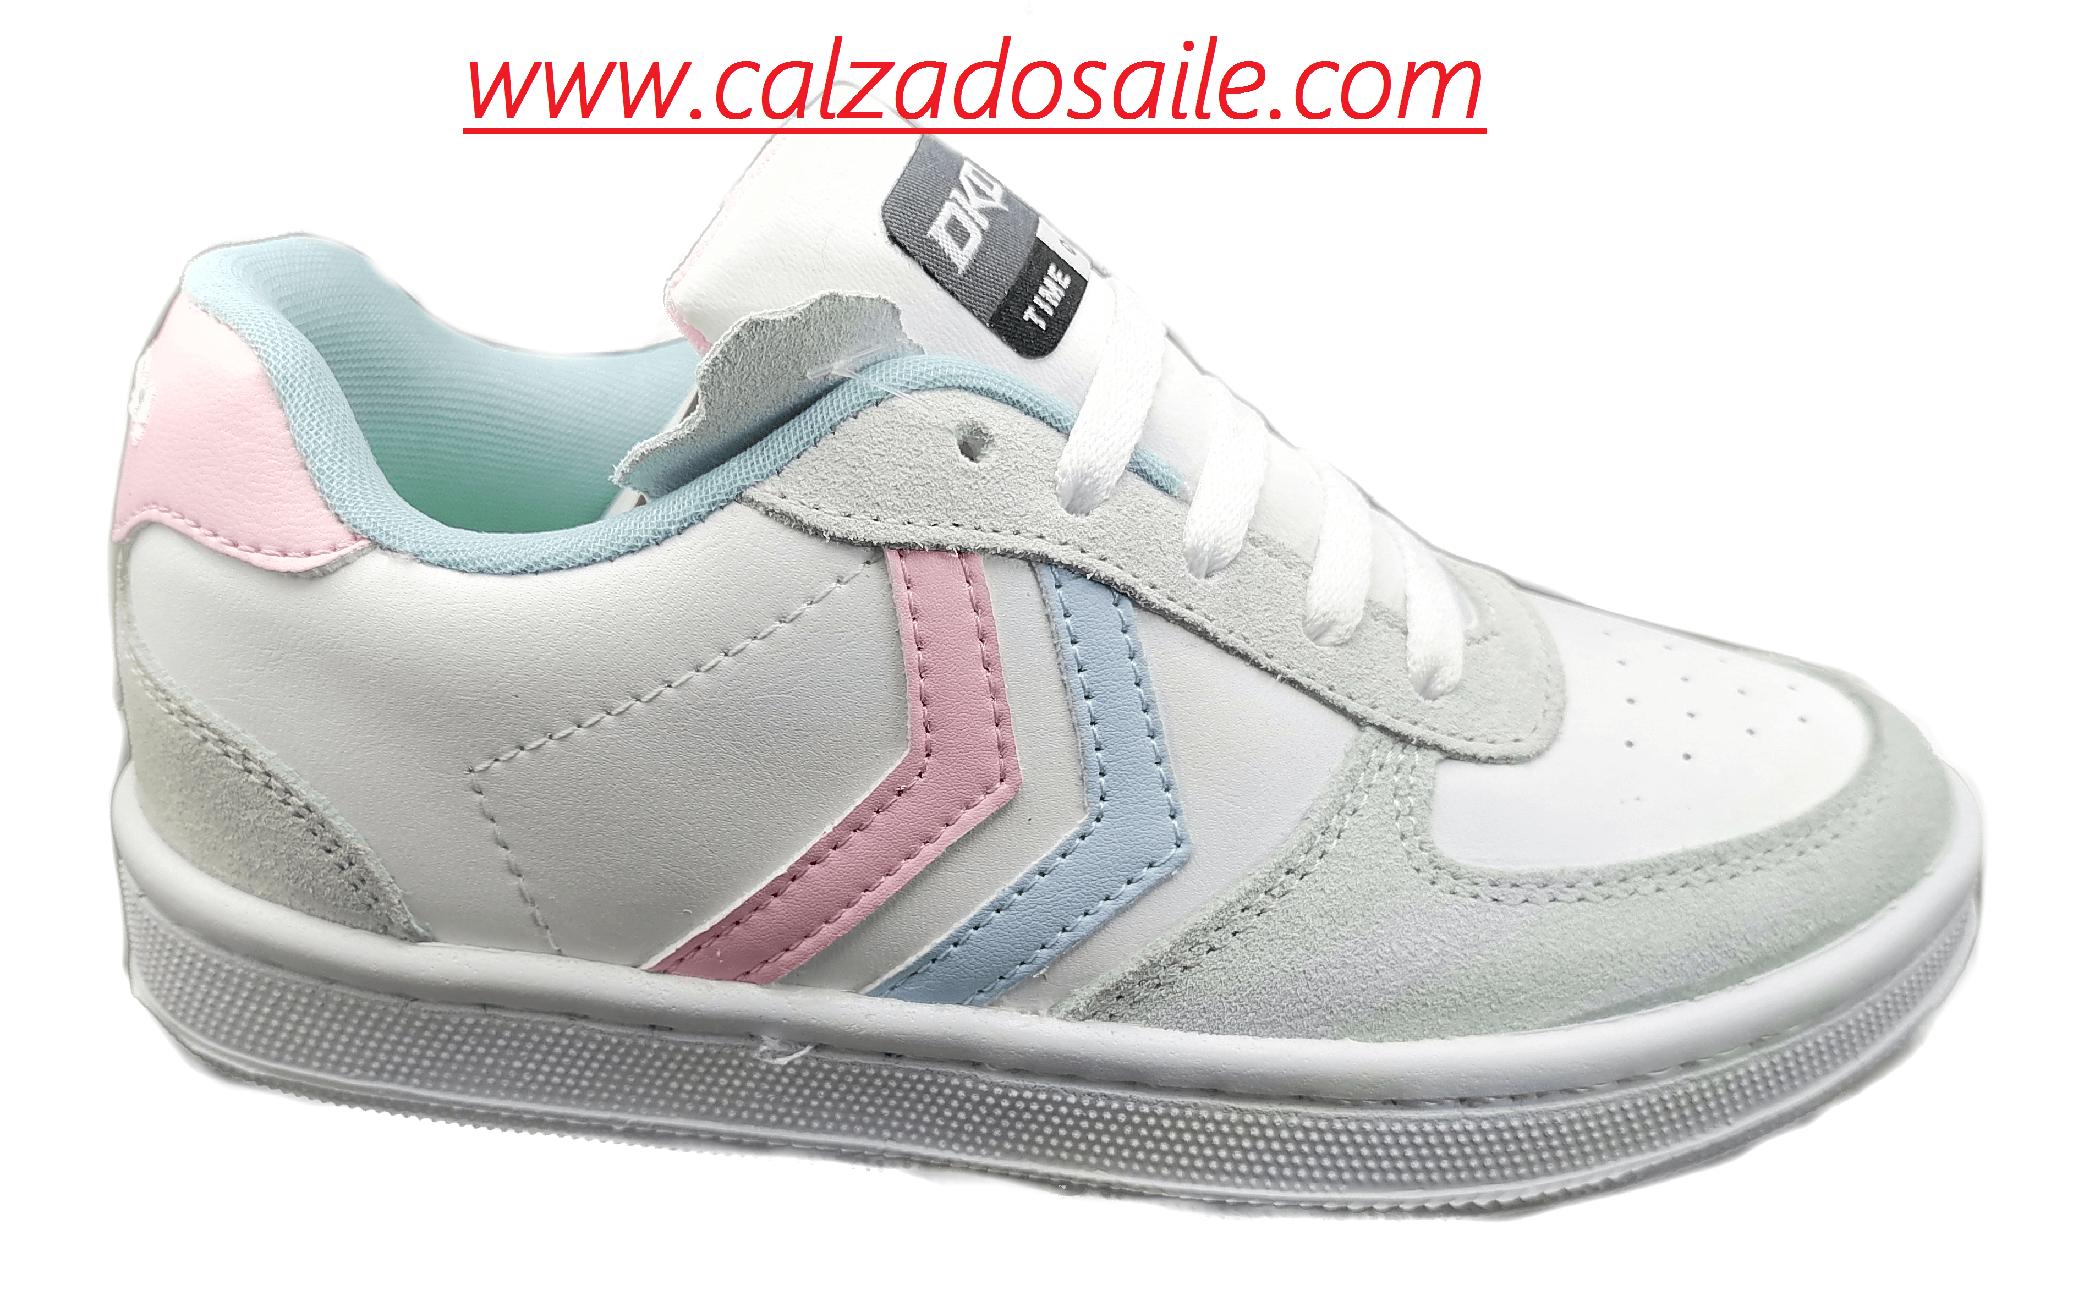 Tenis piel DKDA 7091 bco azul rosa 0 (1)